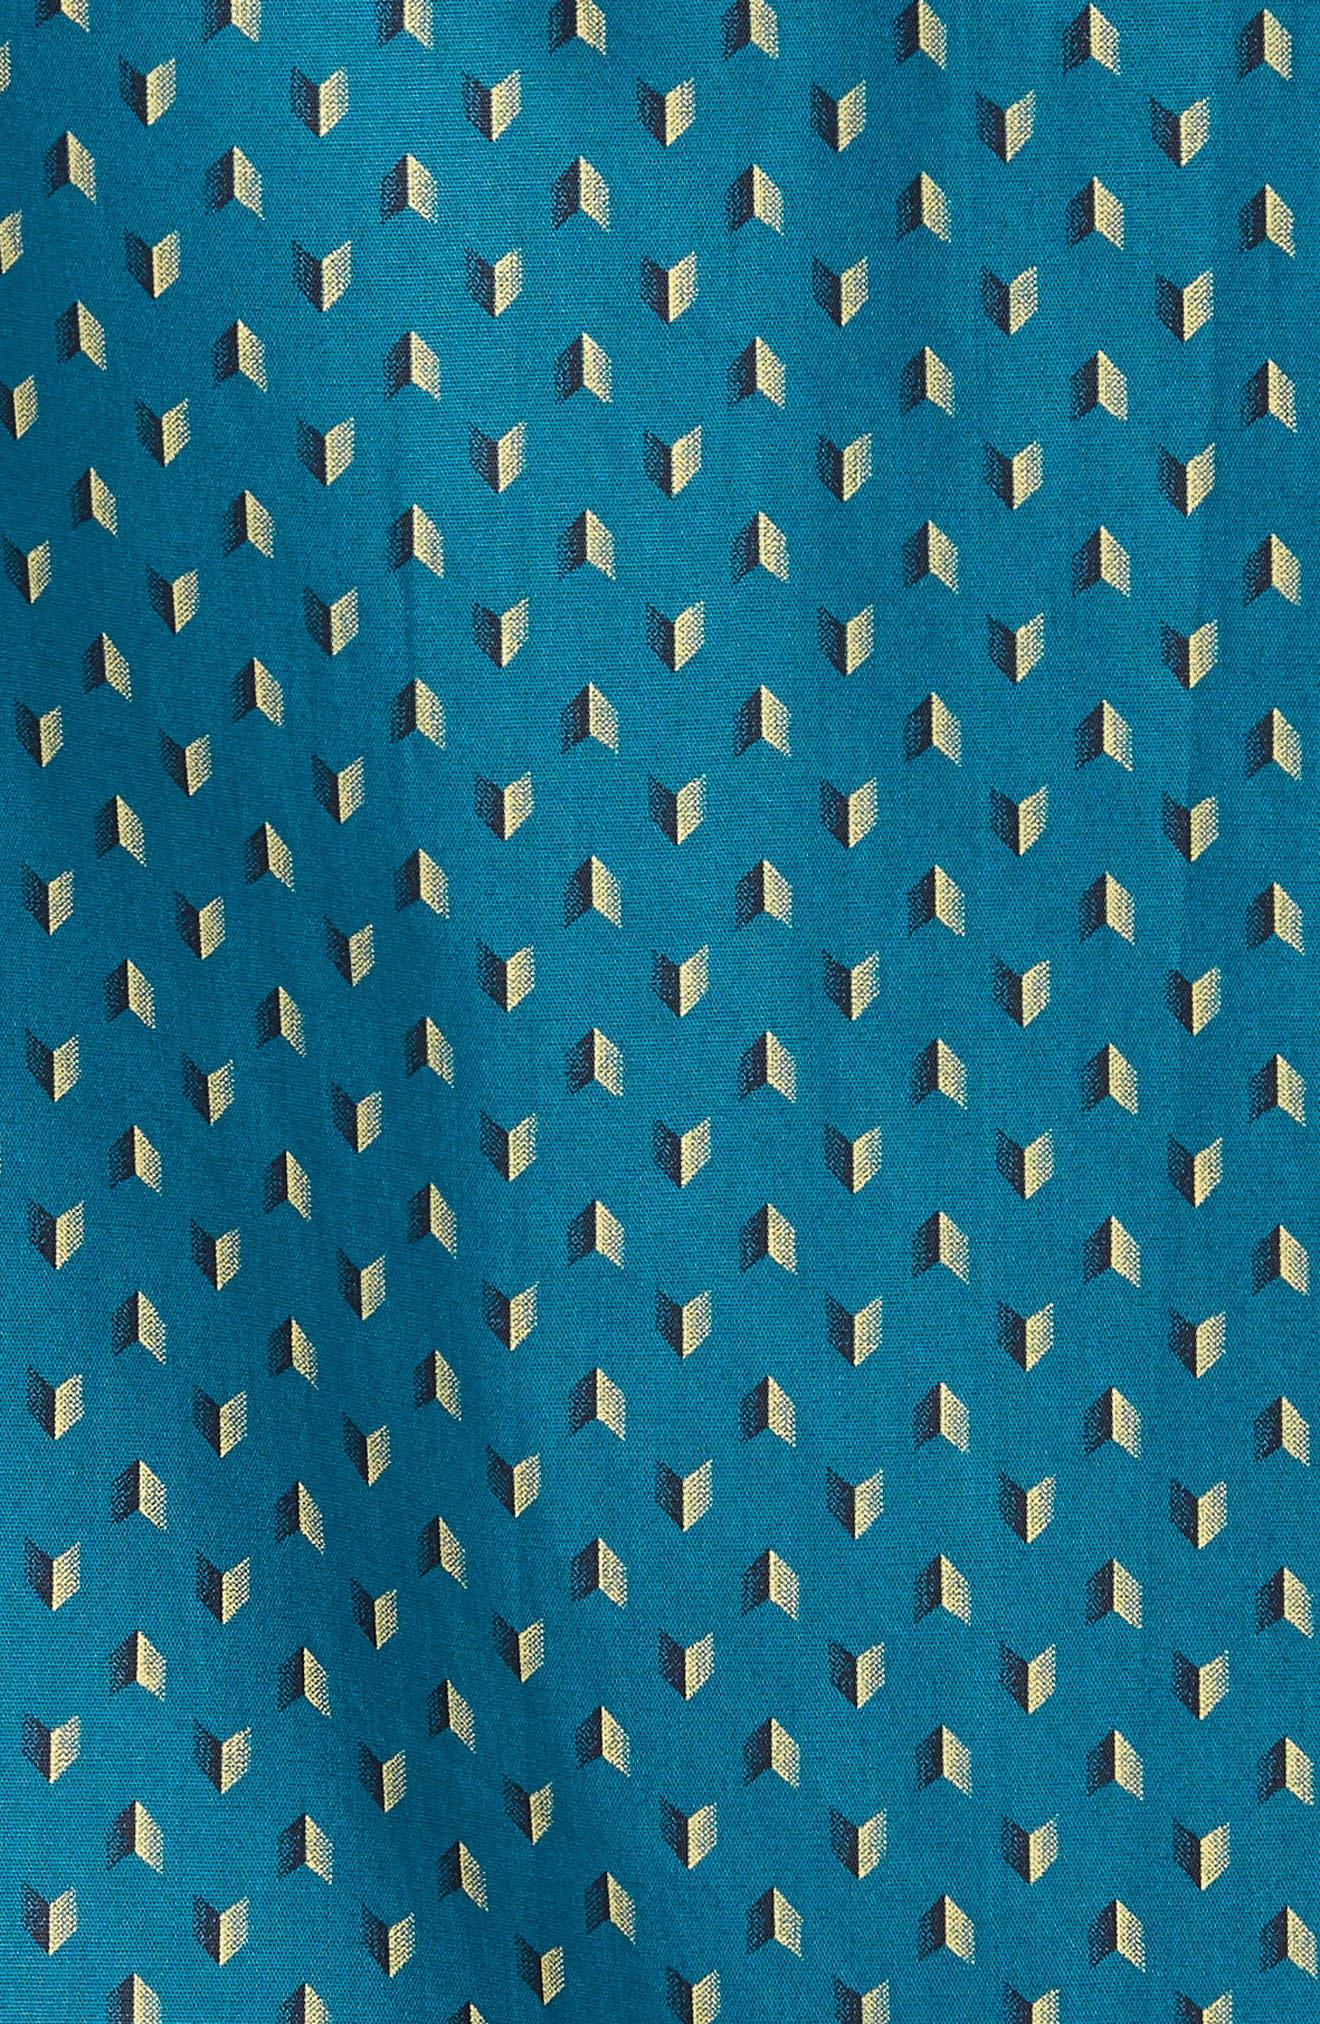 Arrowed Woven Shirt,                             Alternate thumbnail 5, color,                             Blue Tide